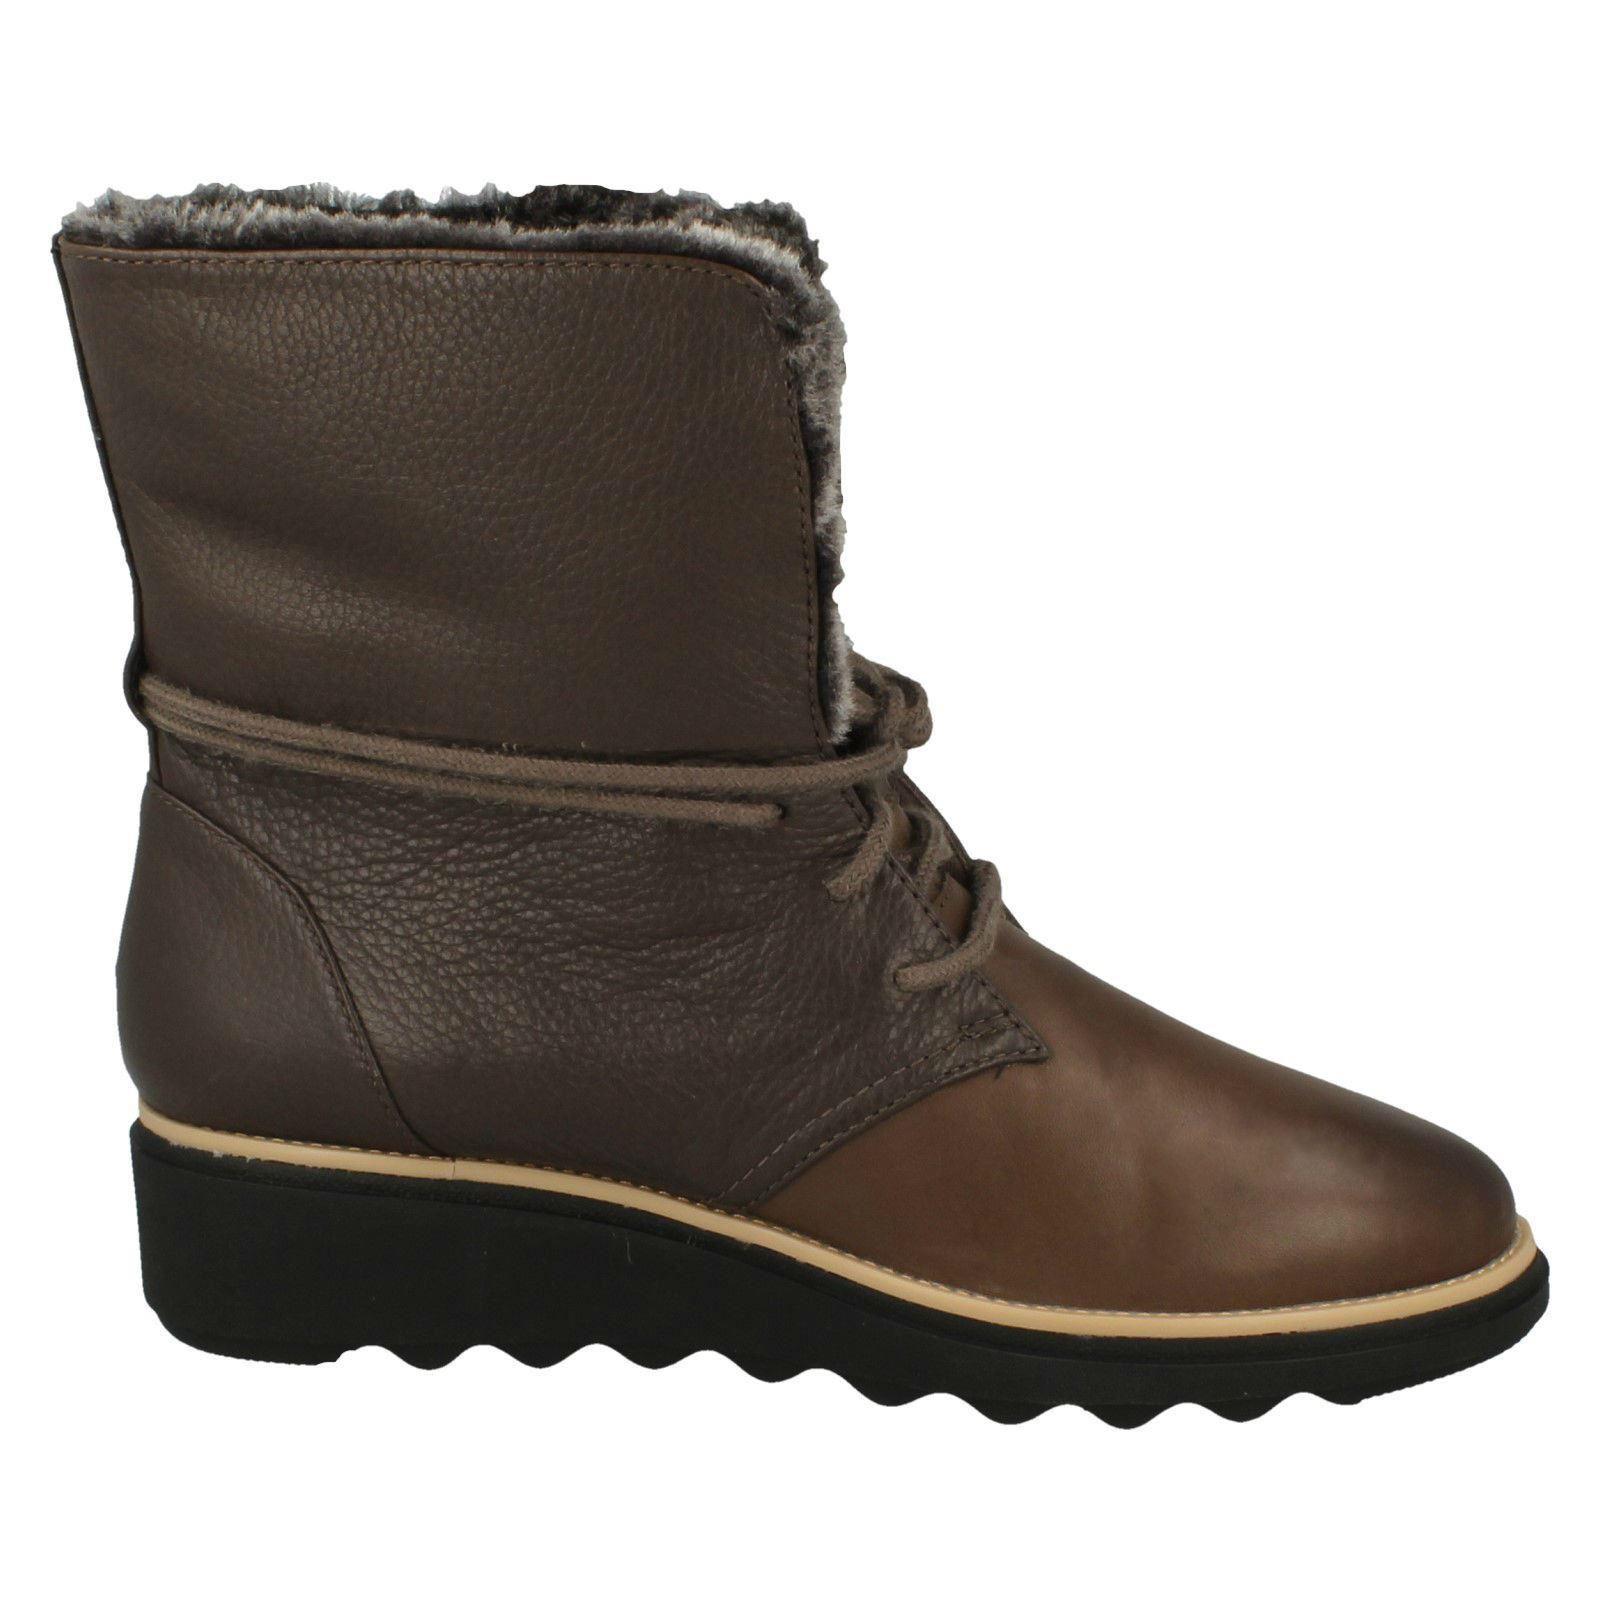 Womens-Clarks Winter Boots Sharon Pearl | eBay